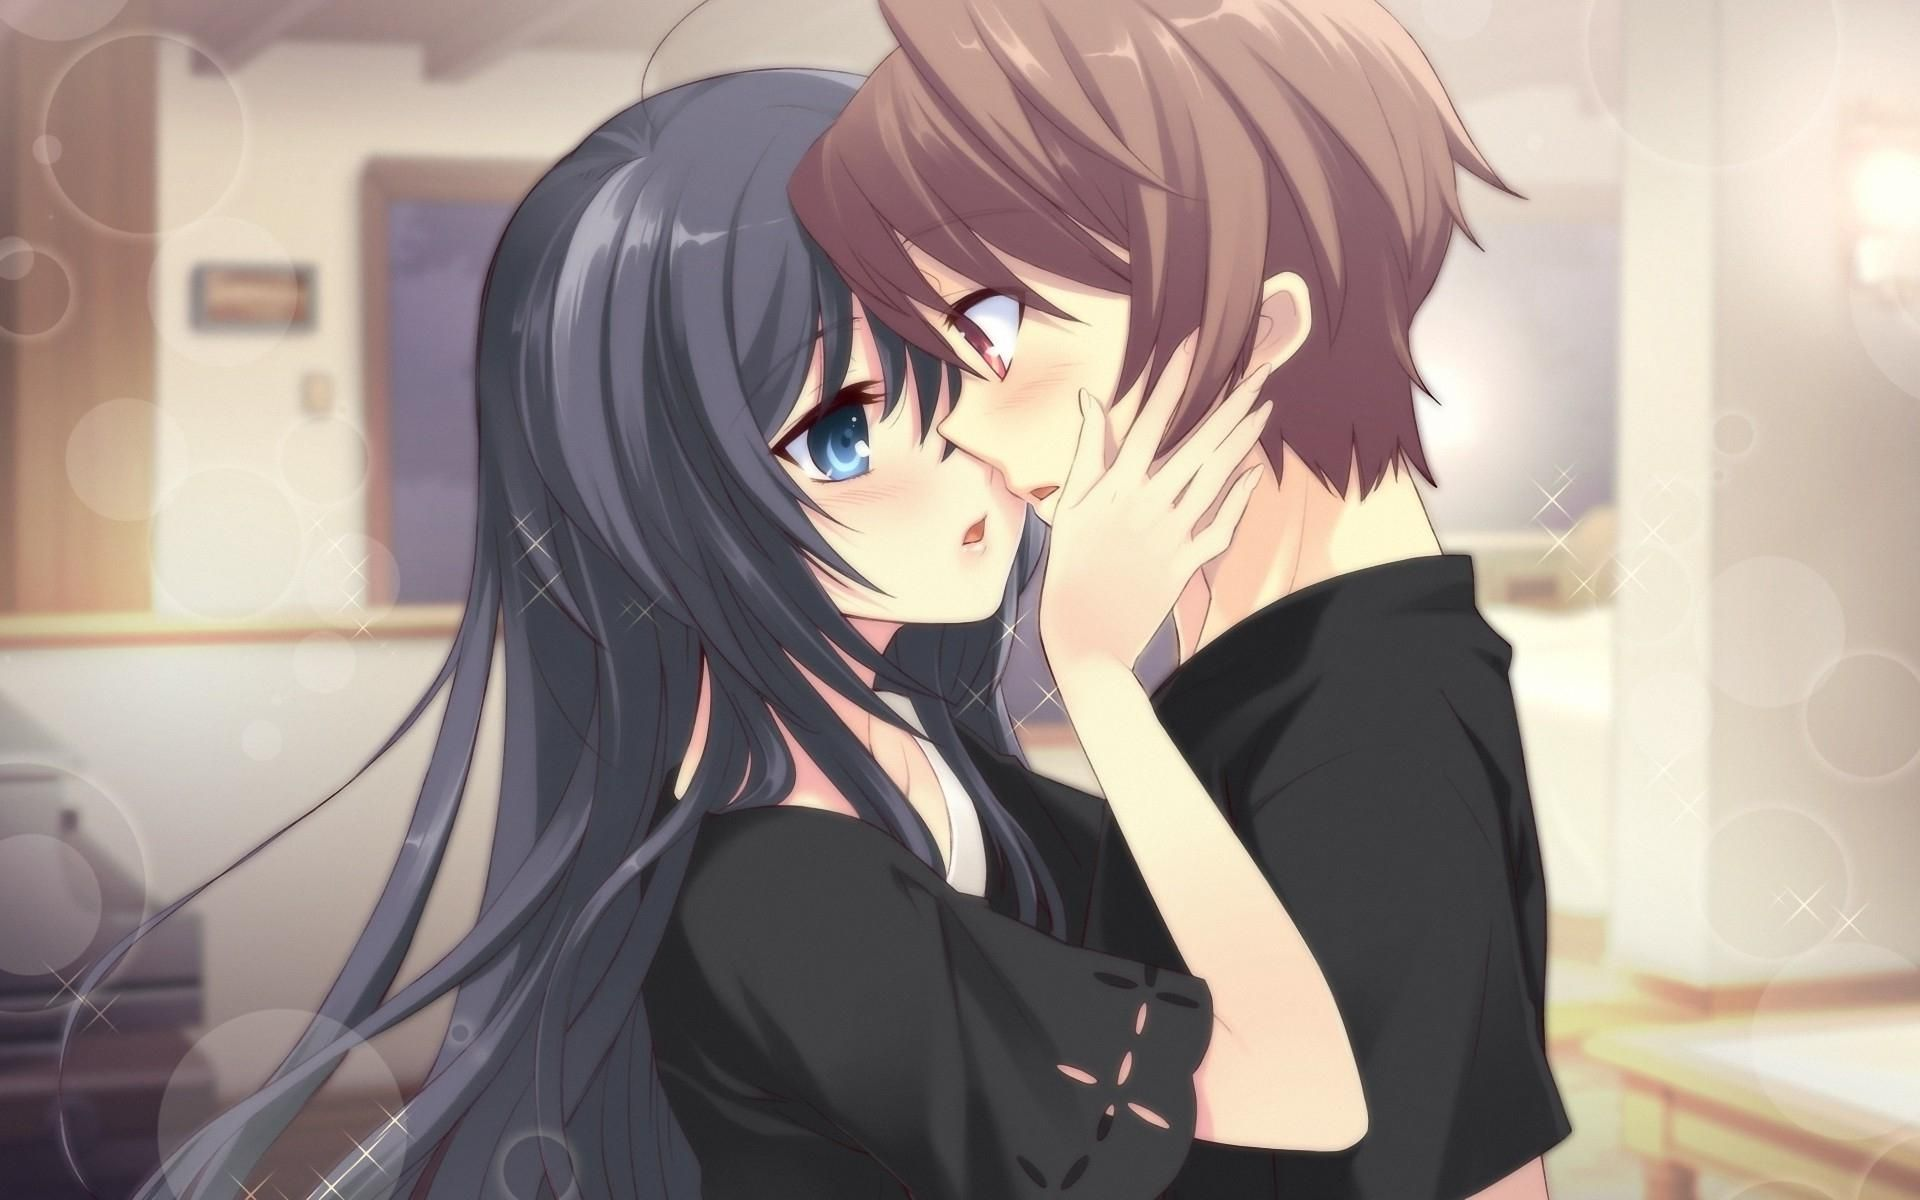 Kiss N Con Imagenes Parejas Anime Bonitas Parejas De Anime